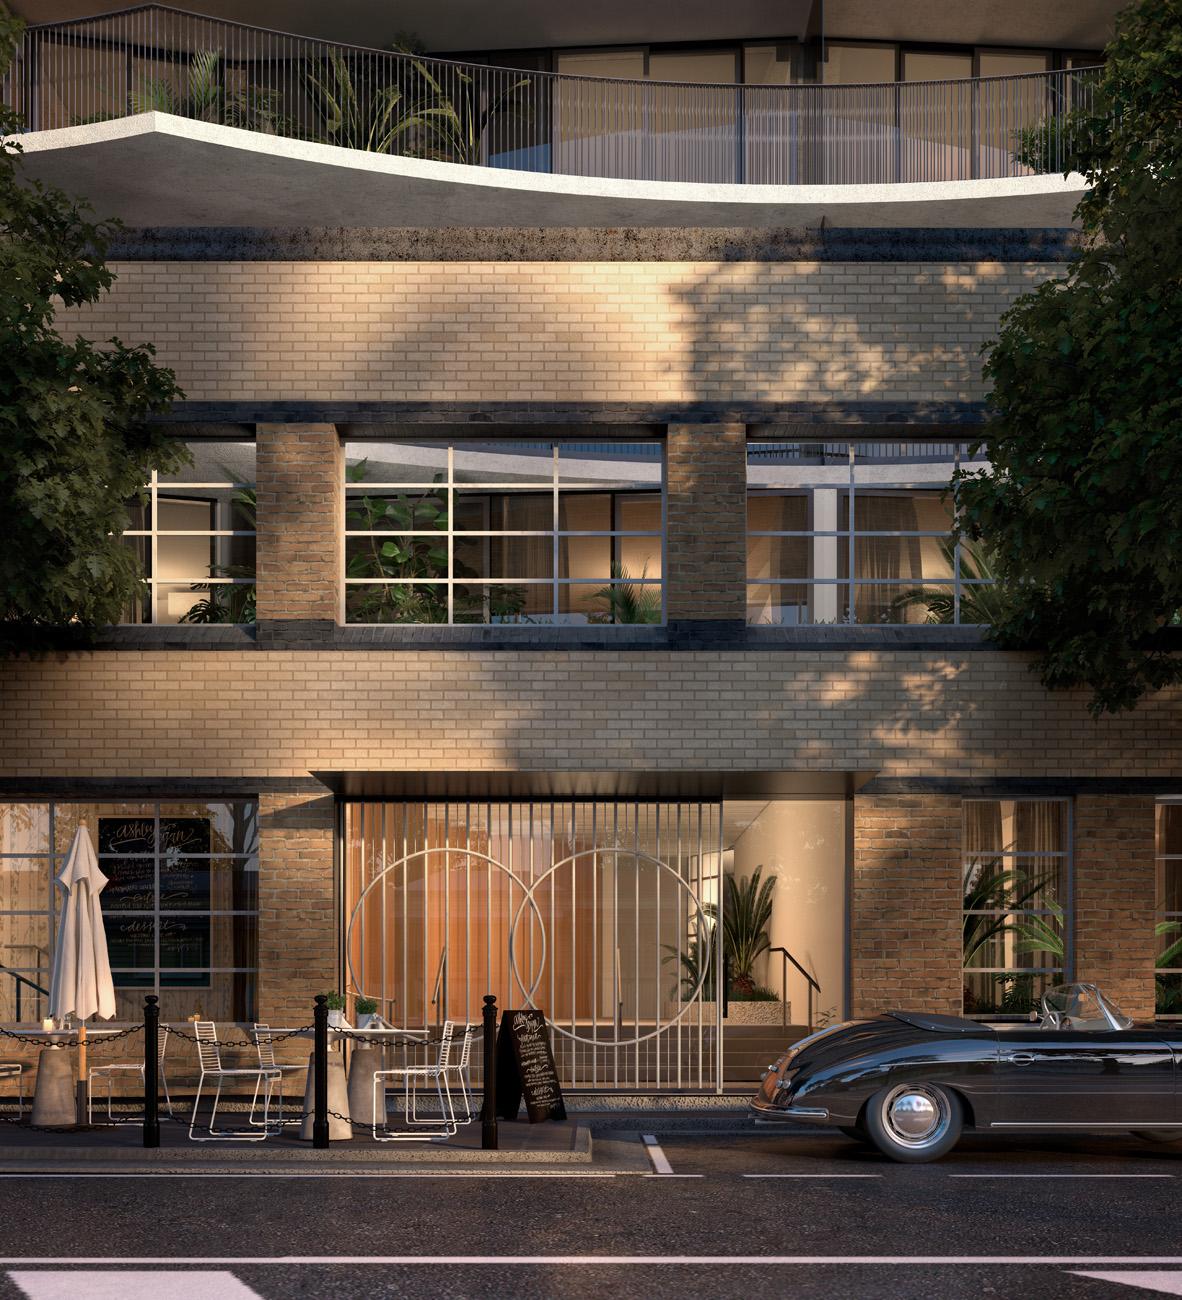 fkd-studio-Holme-apartments-3d-visualisation-images